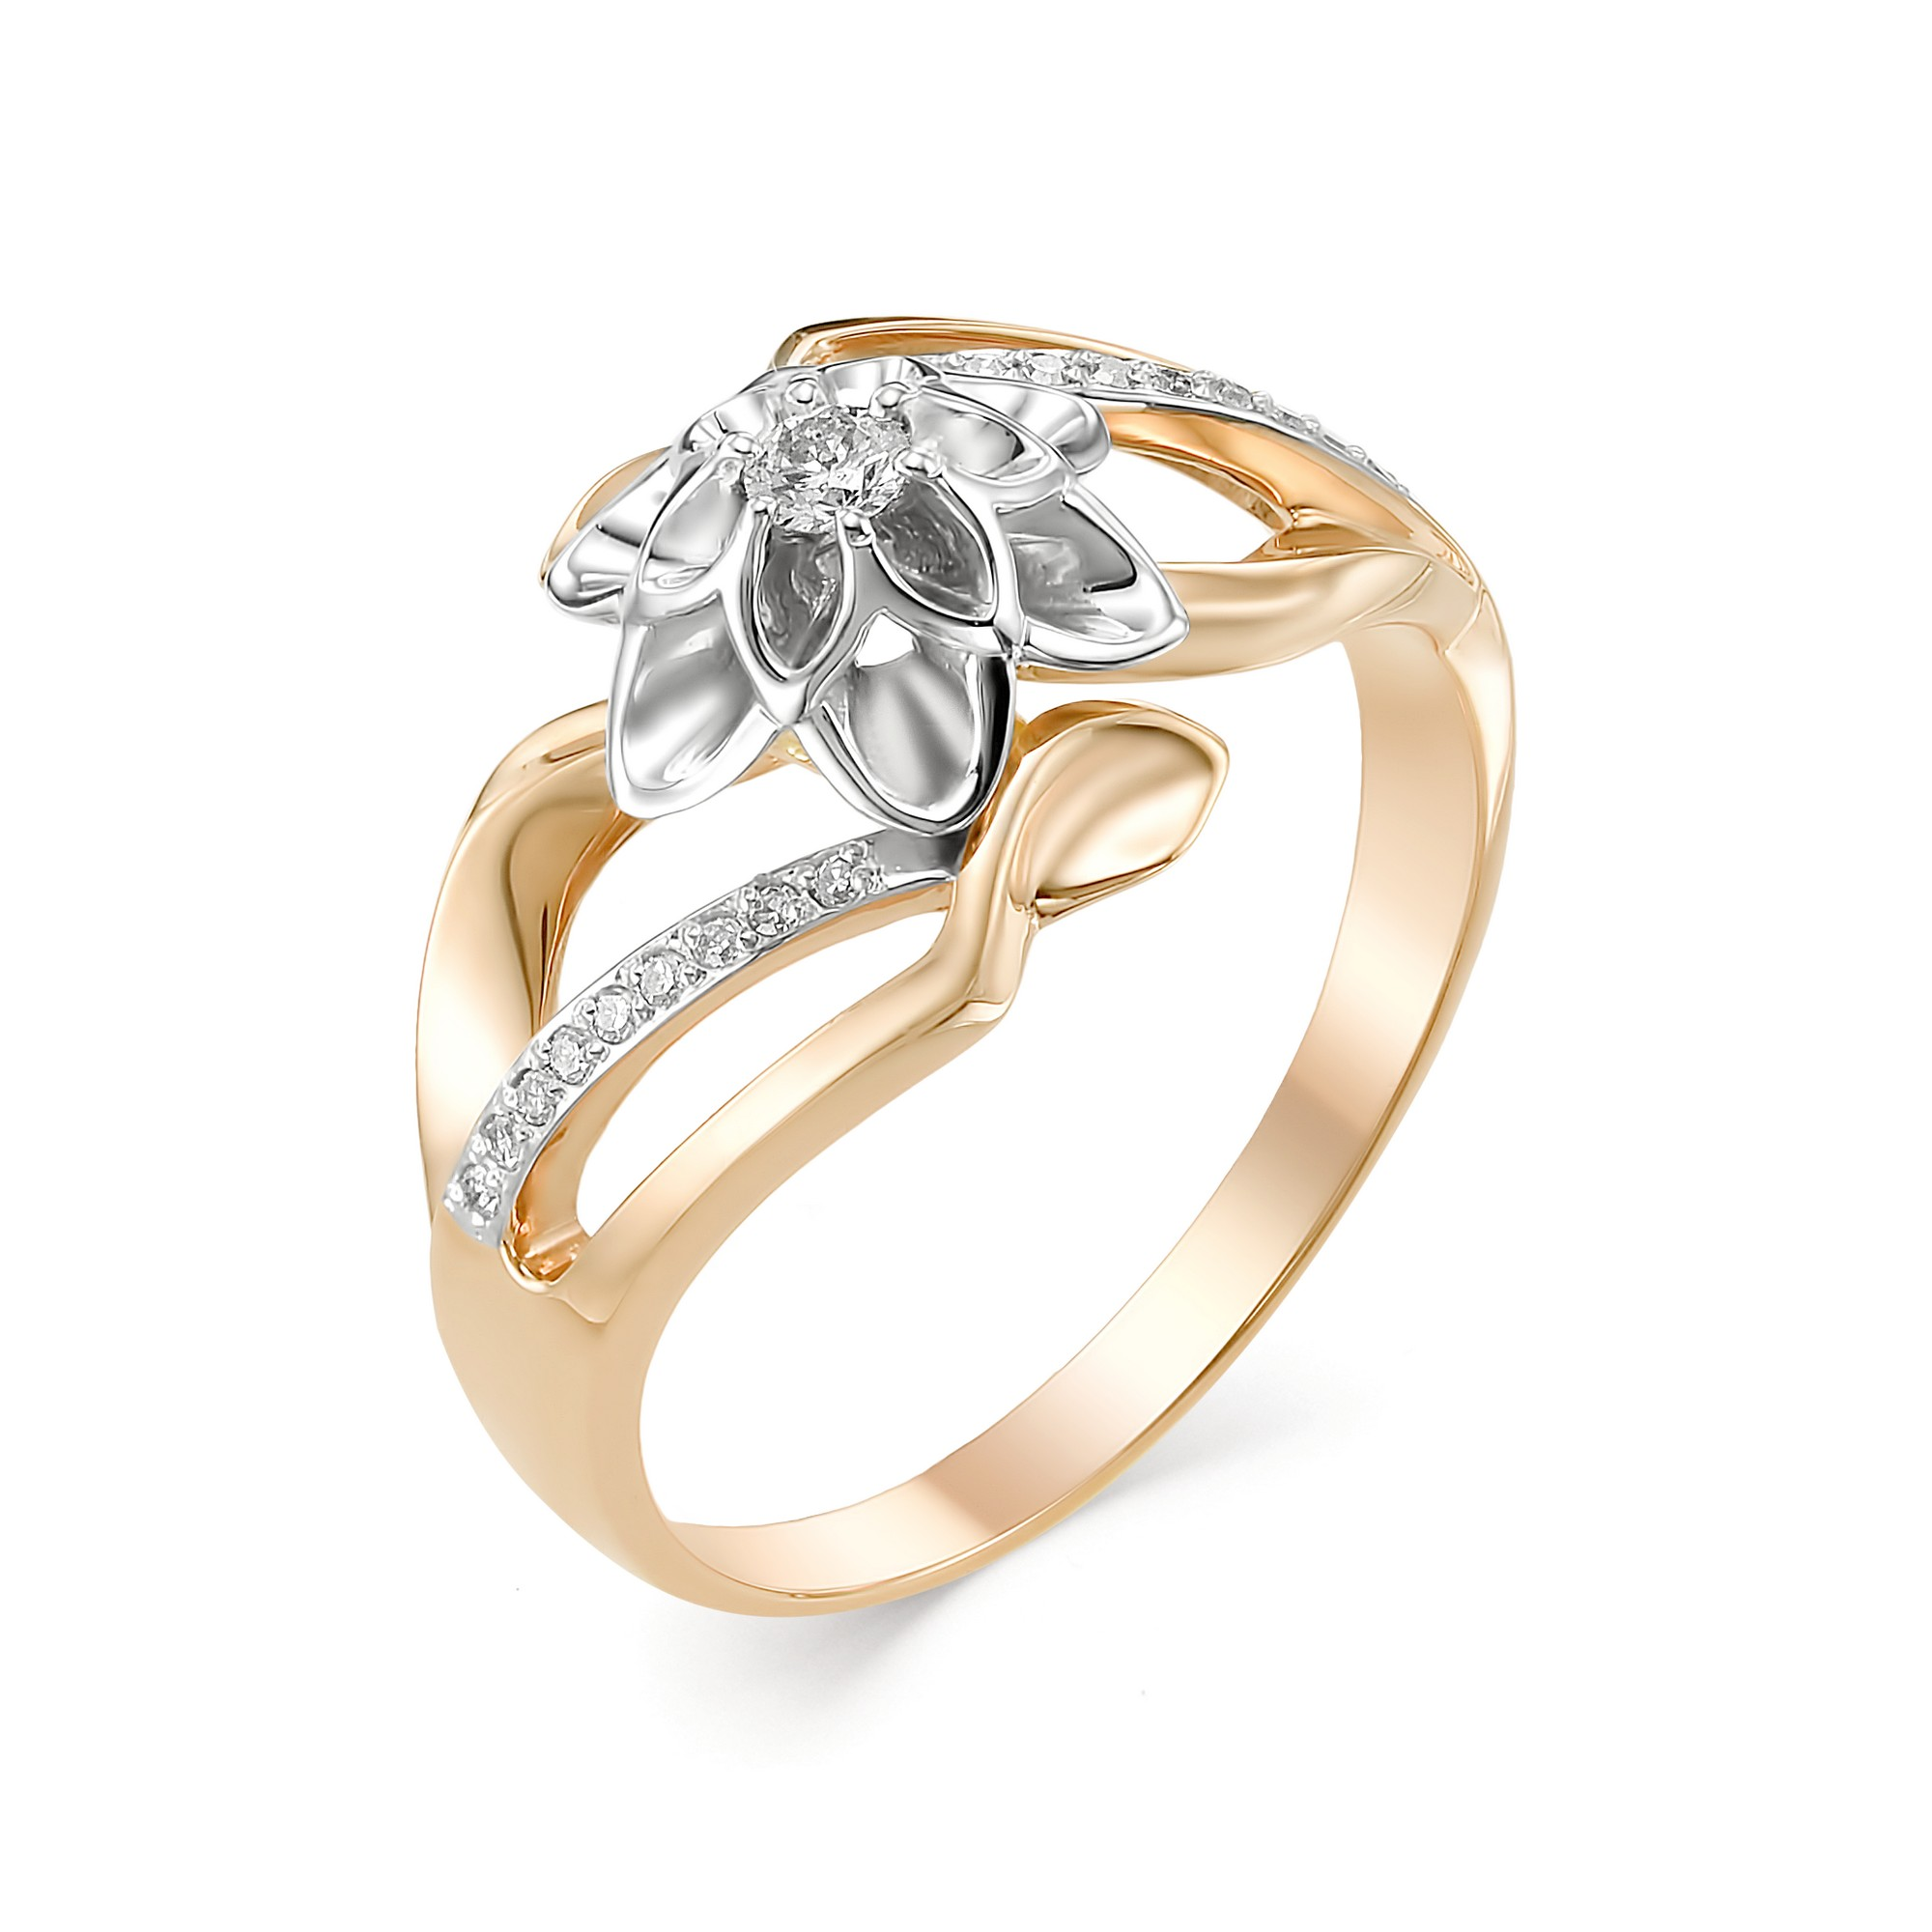 картинка кольцо 12547-100 1 бриллиант круг 57 0,062 15-20 3/6а, 18 бриллиант круг 17 0,055 200-400 2/3а 12547-100